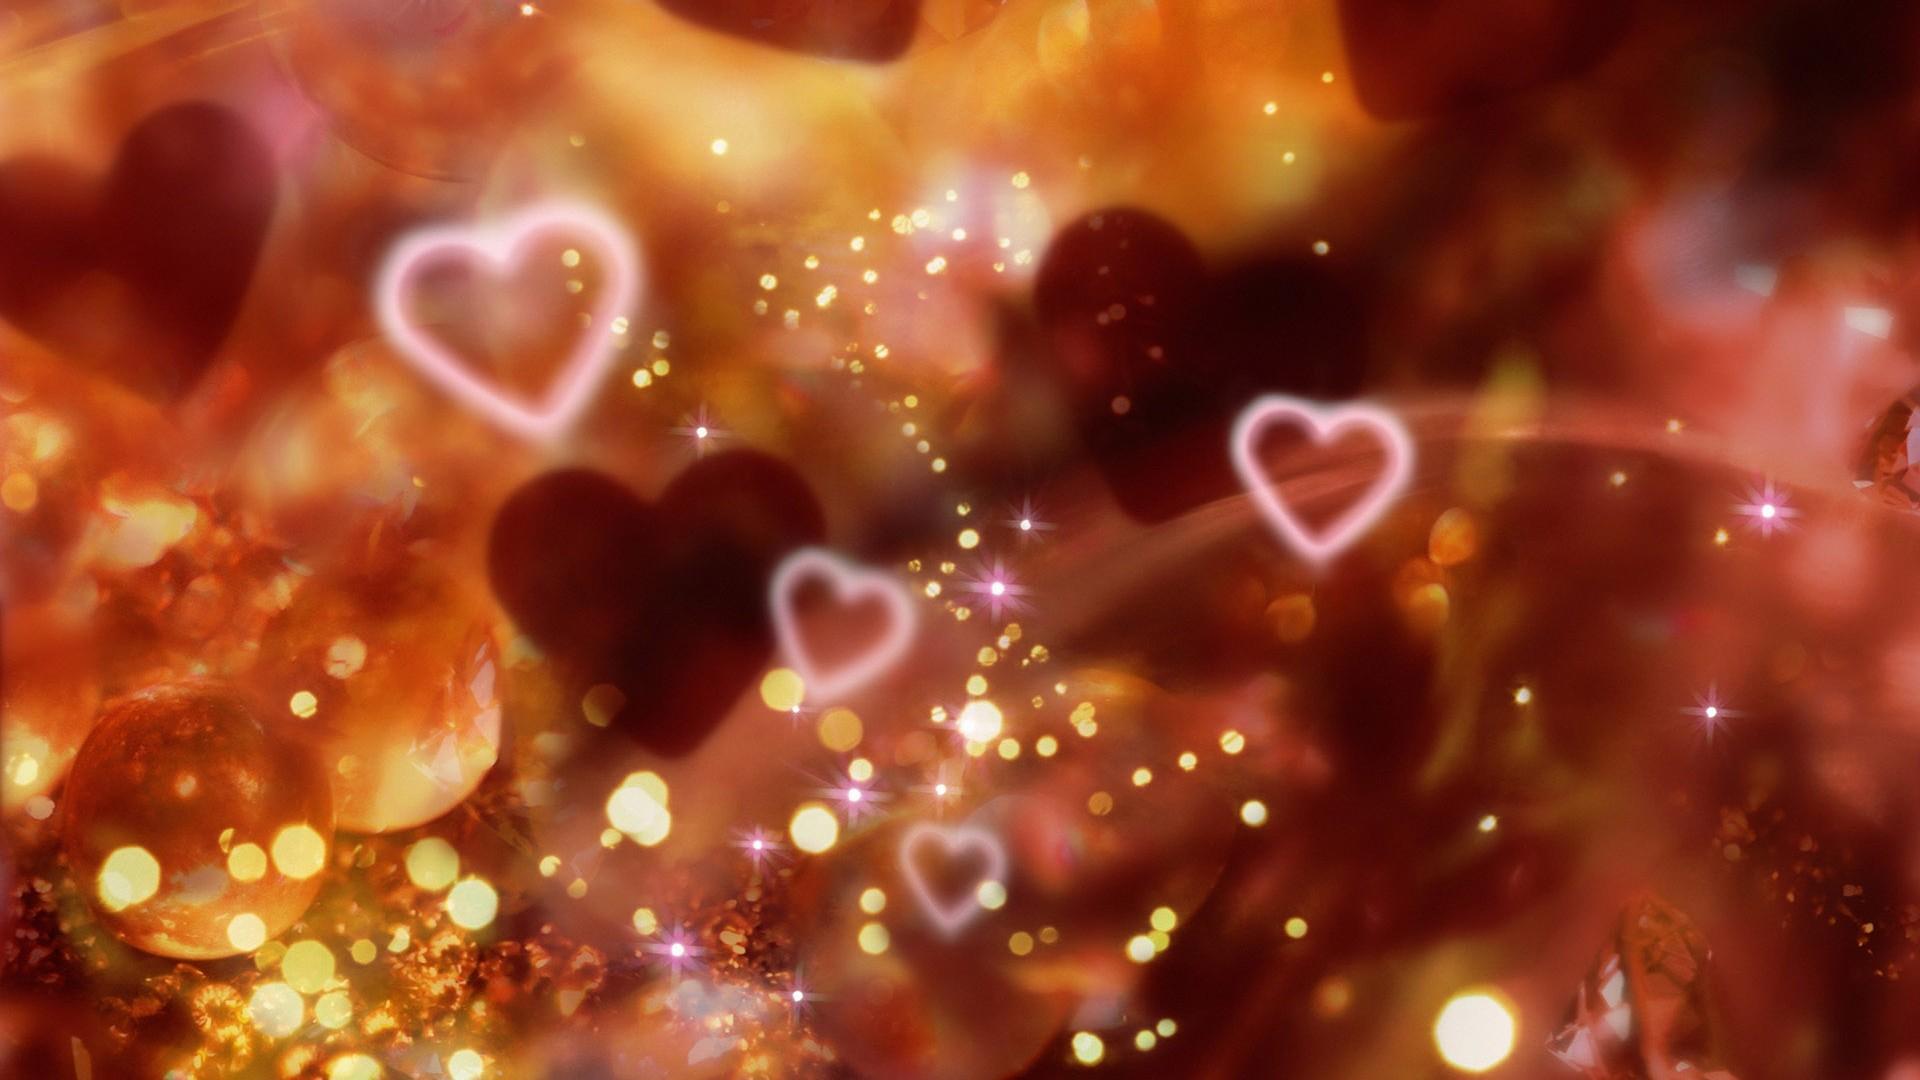 animated hearts christmas wallpapers